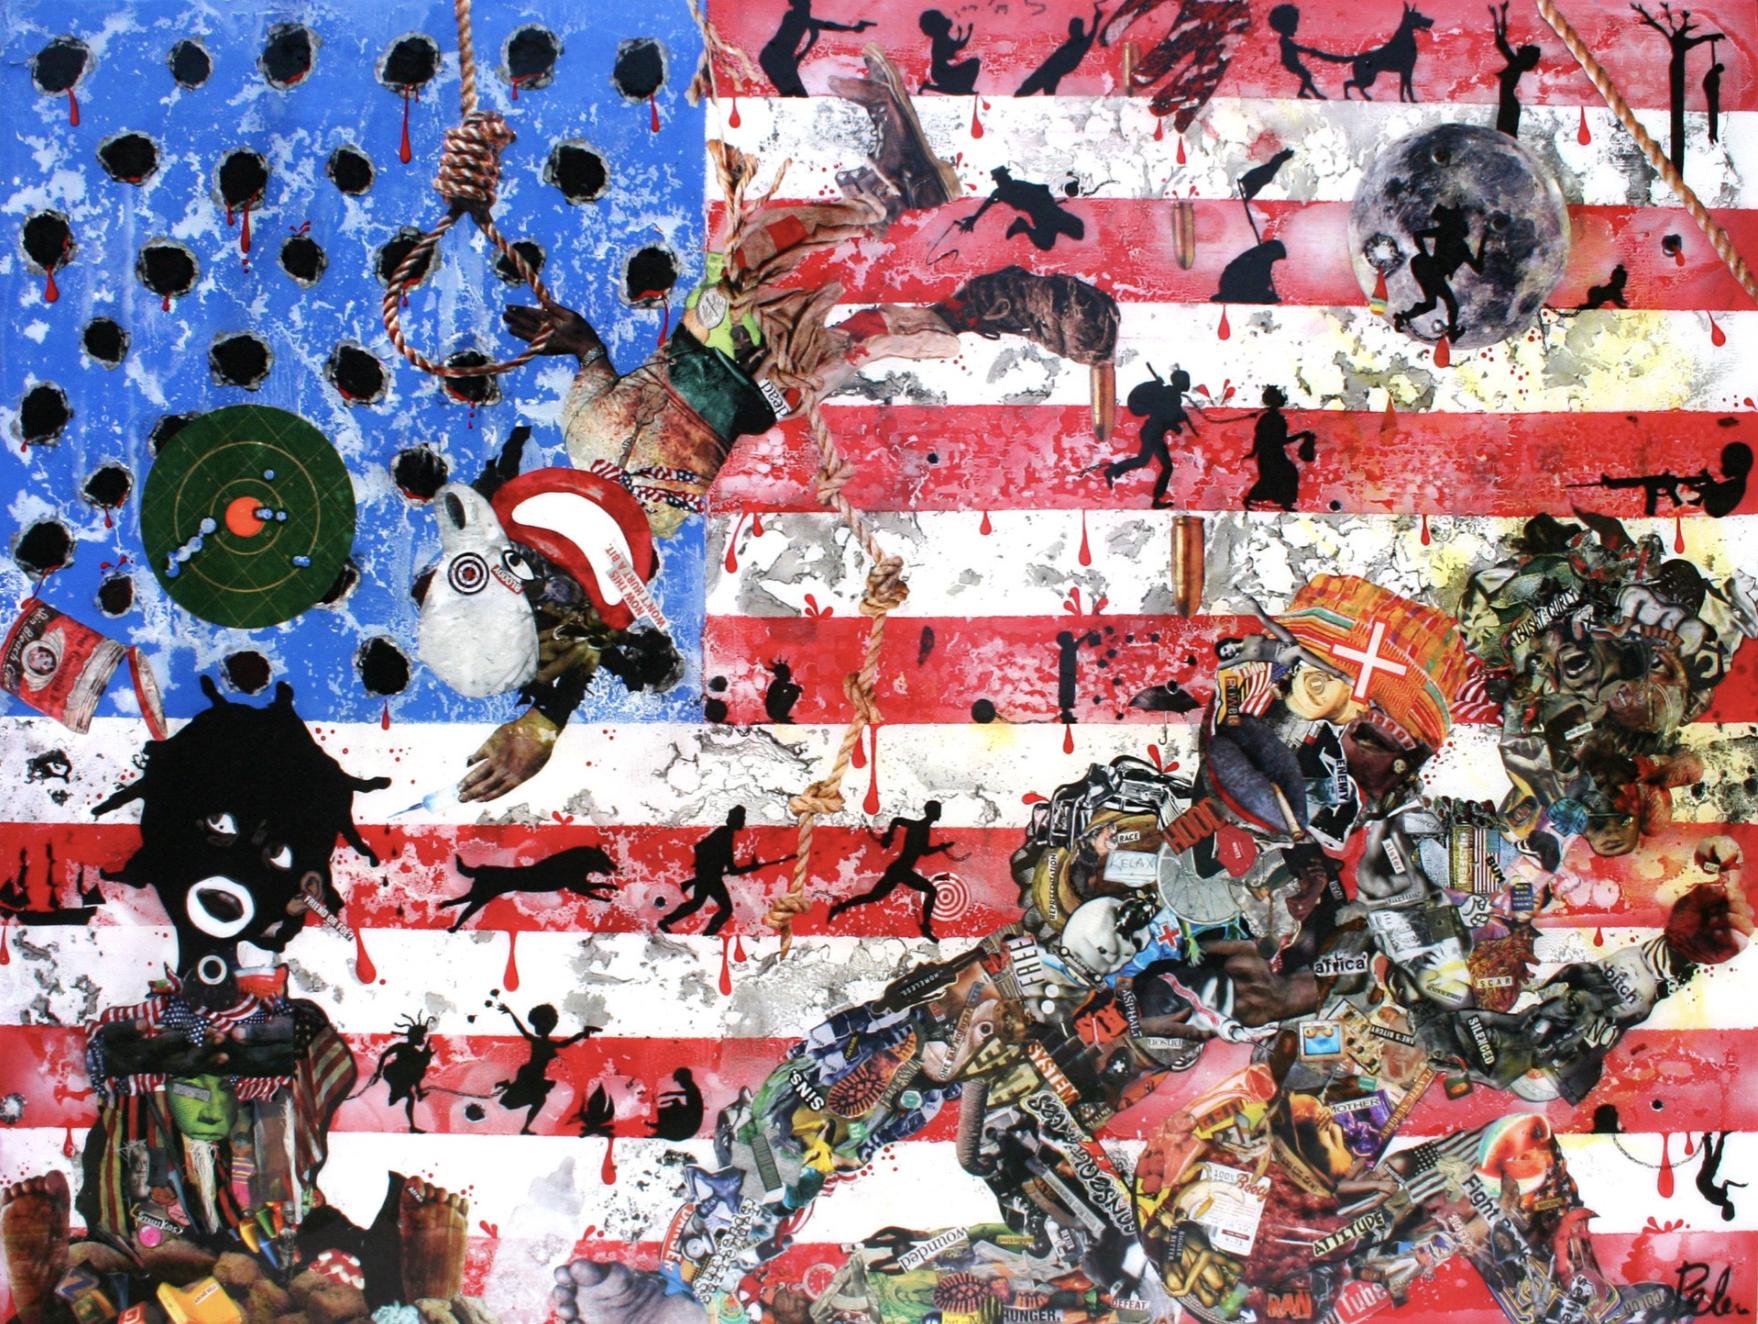 Penda Diakité, 'Made in America,' 2018. Pitroda Art